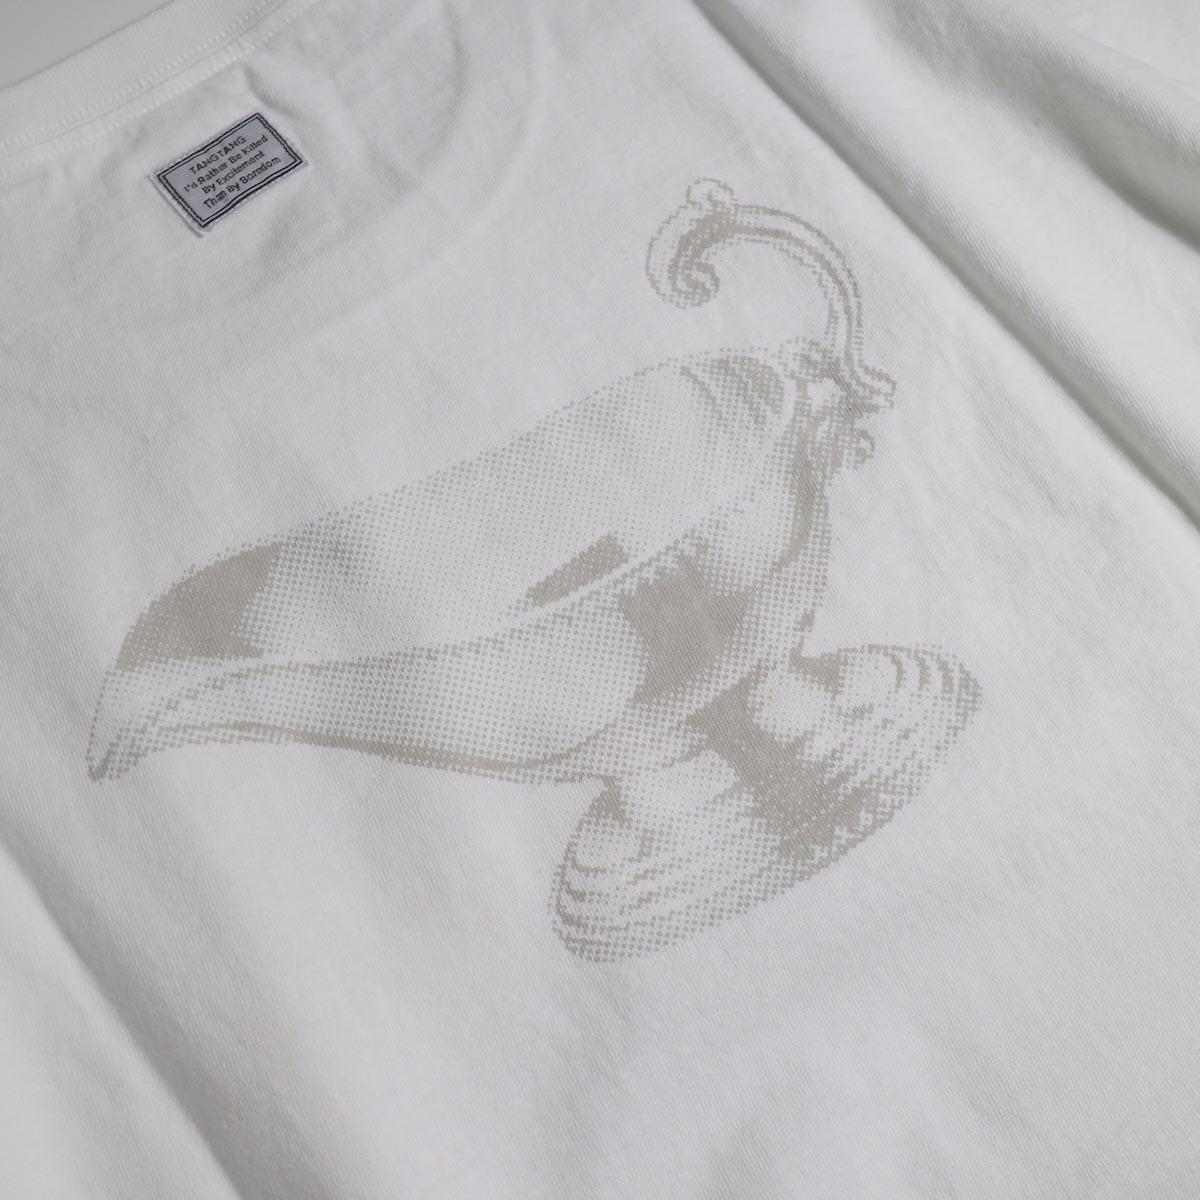 TANGTANG / CURRY -HANDWRITE (White)バックプリント